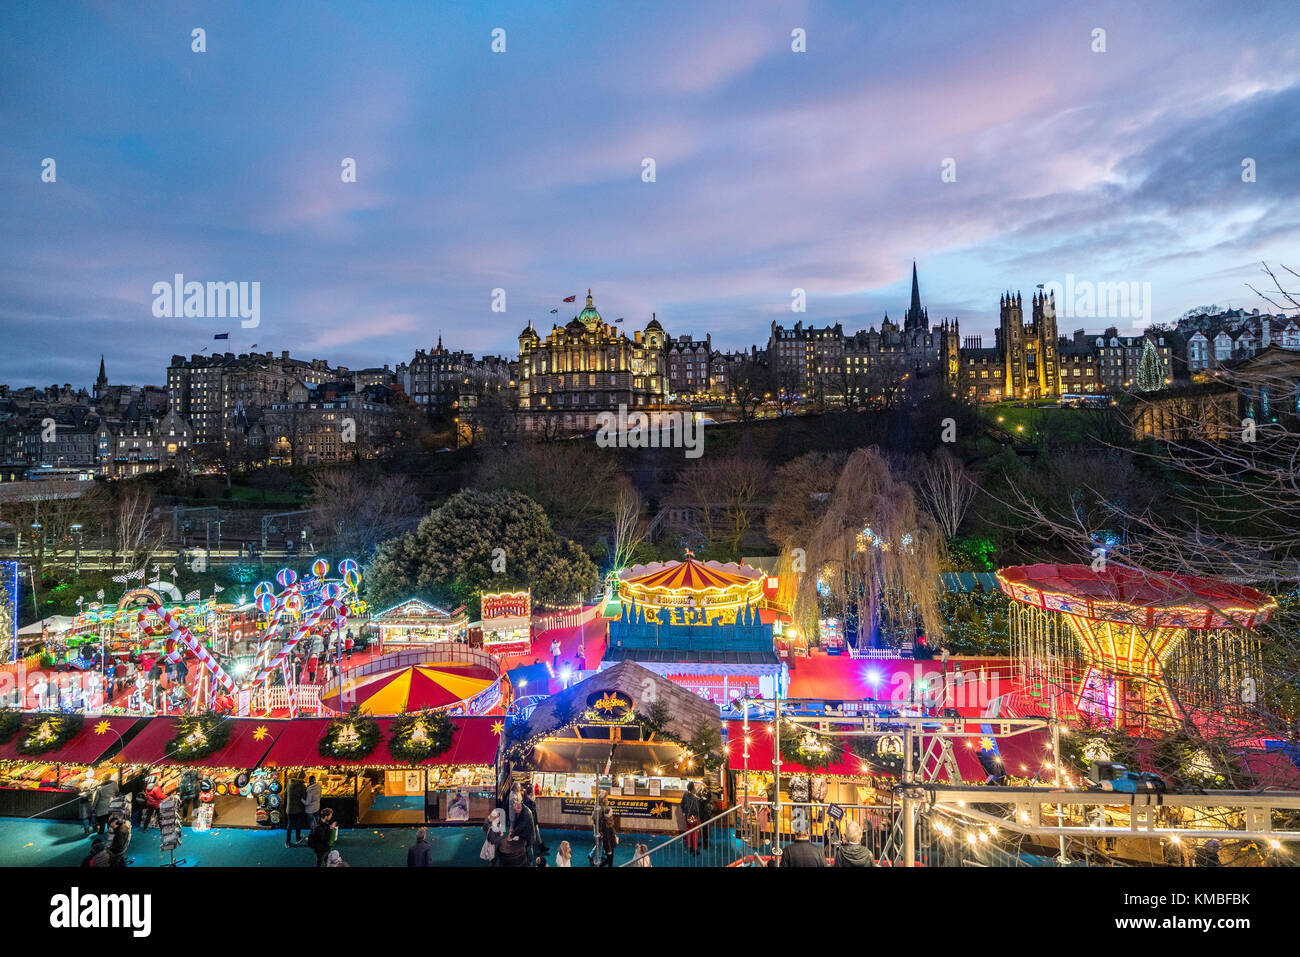 Evening view of funfair at annual Edinburgh Christmas Market in Scotland, United Kingdom Stock Photo